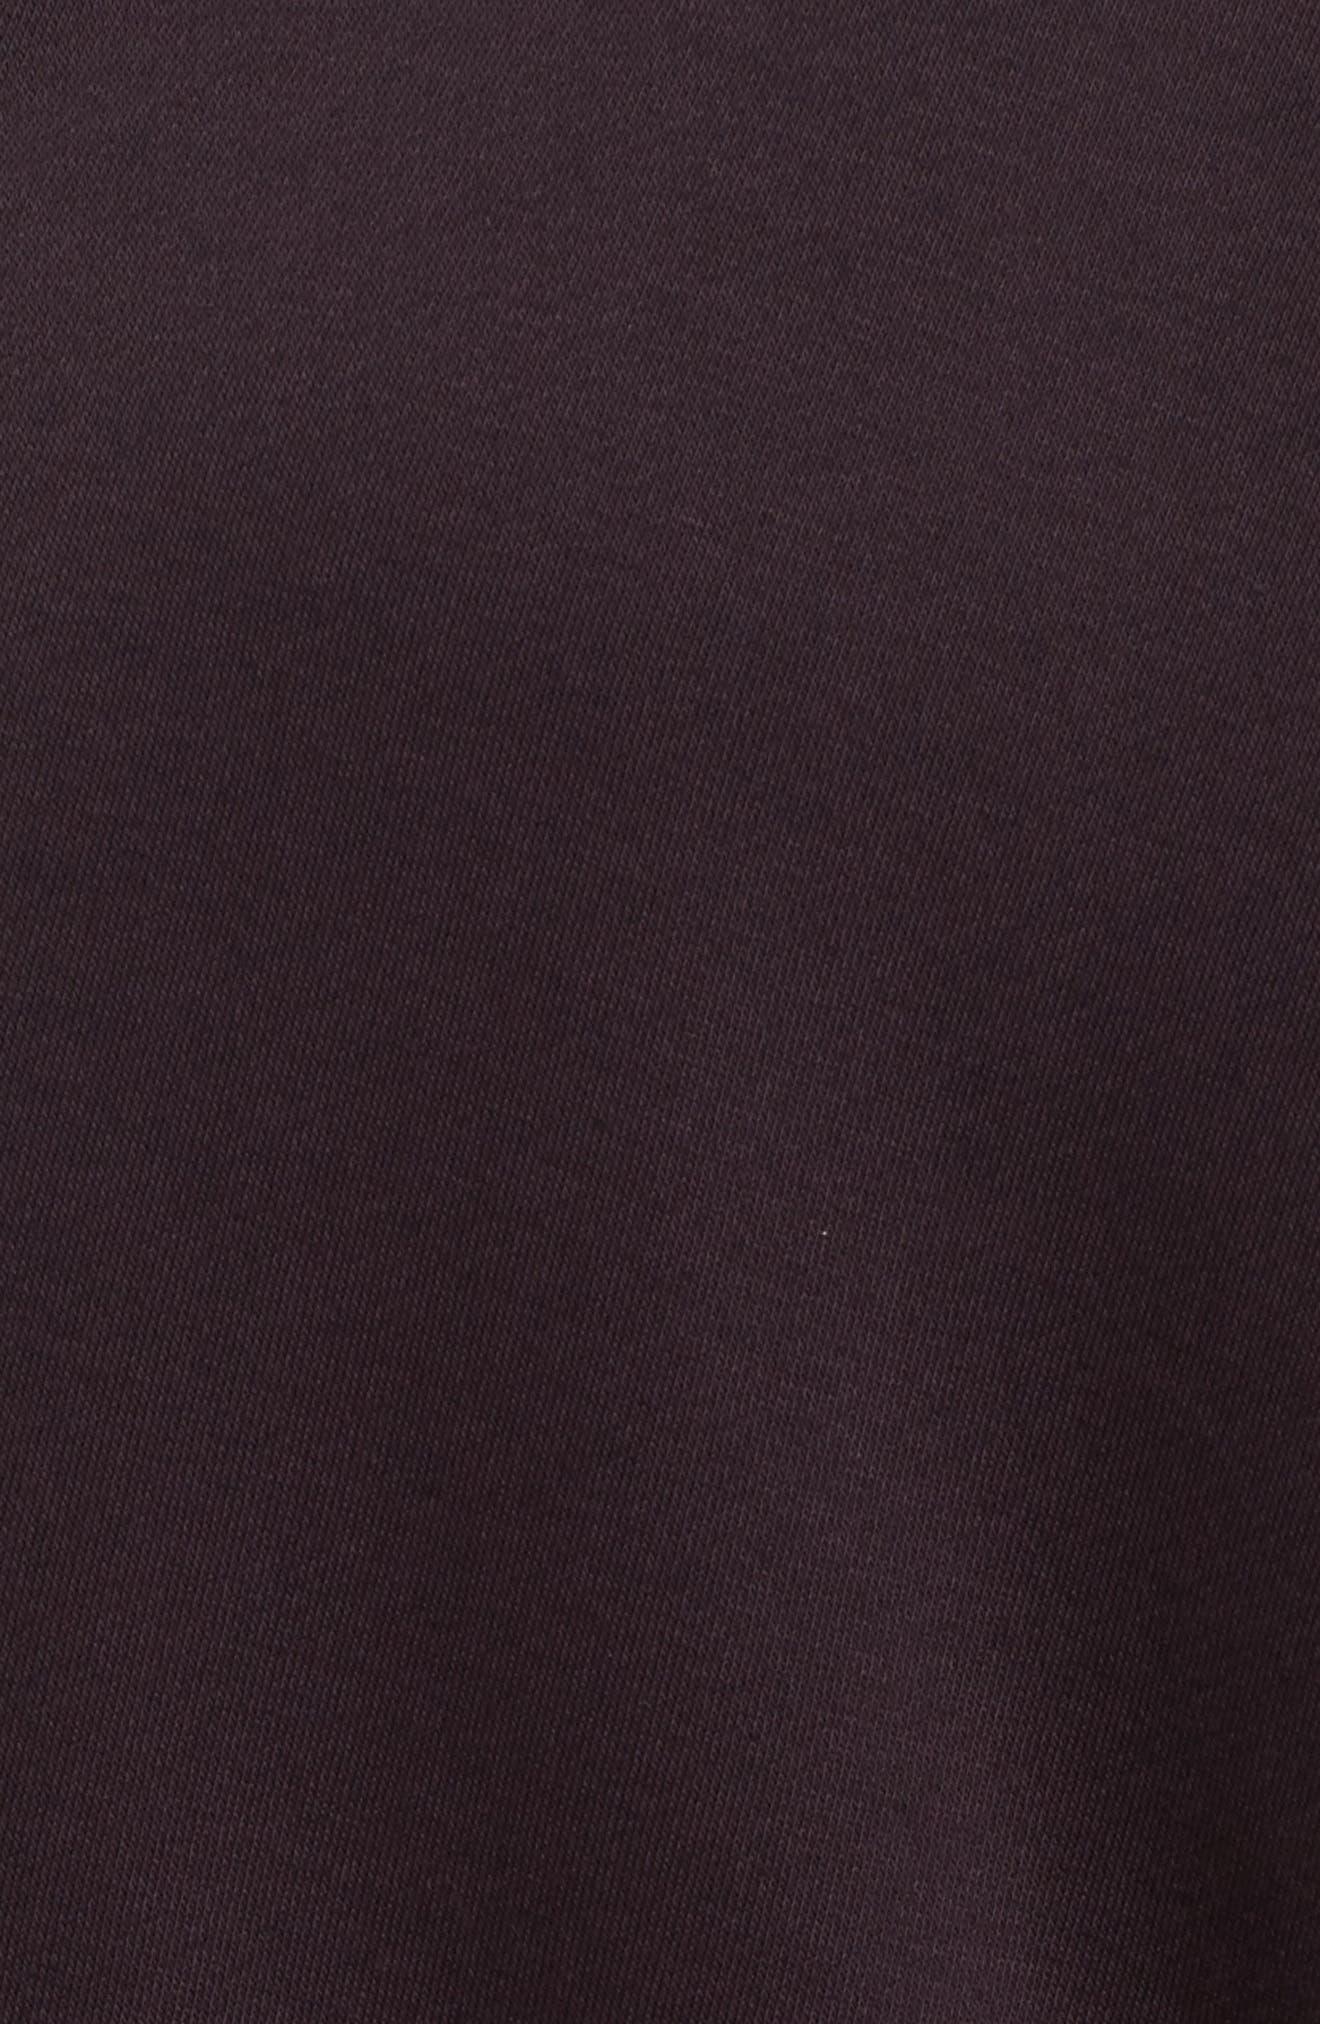 Sportswear Modern Cardigan,                             Alternate thumbnail 4, color,                             Port Wine/ Port Wine